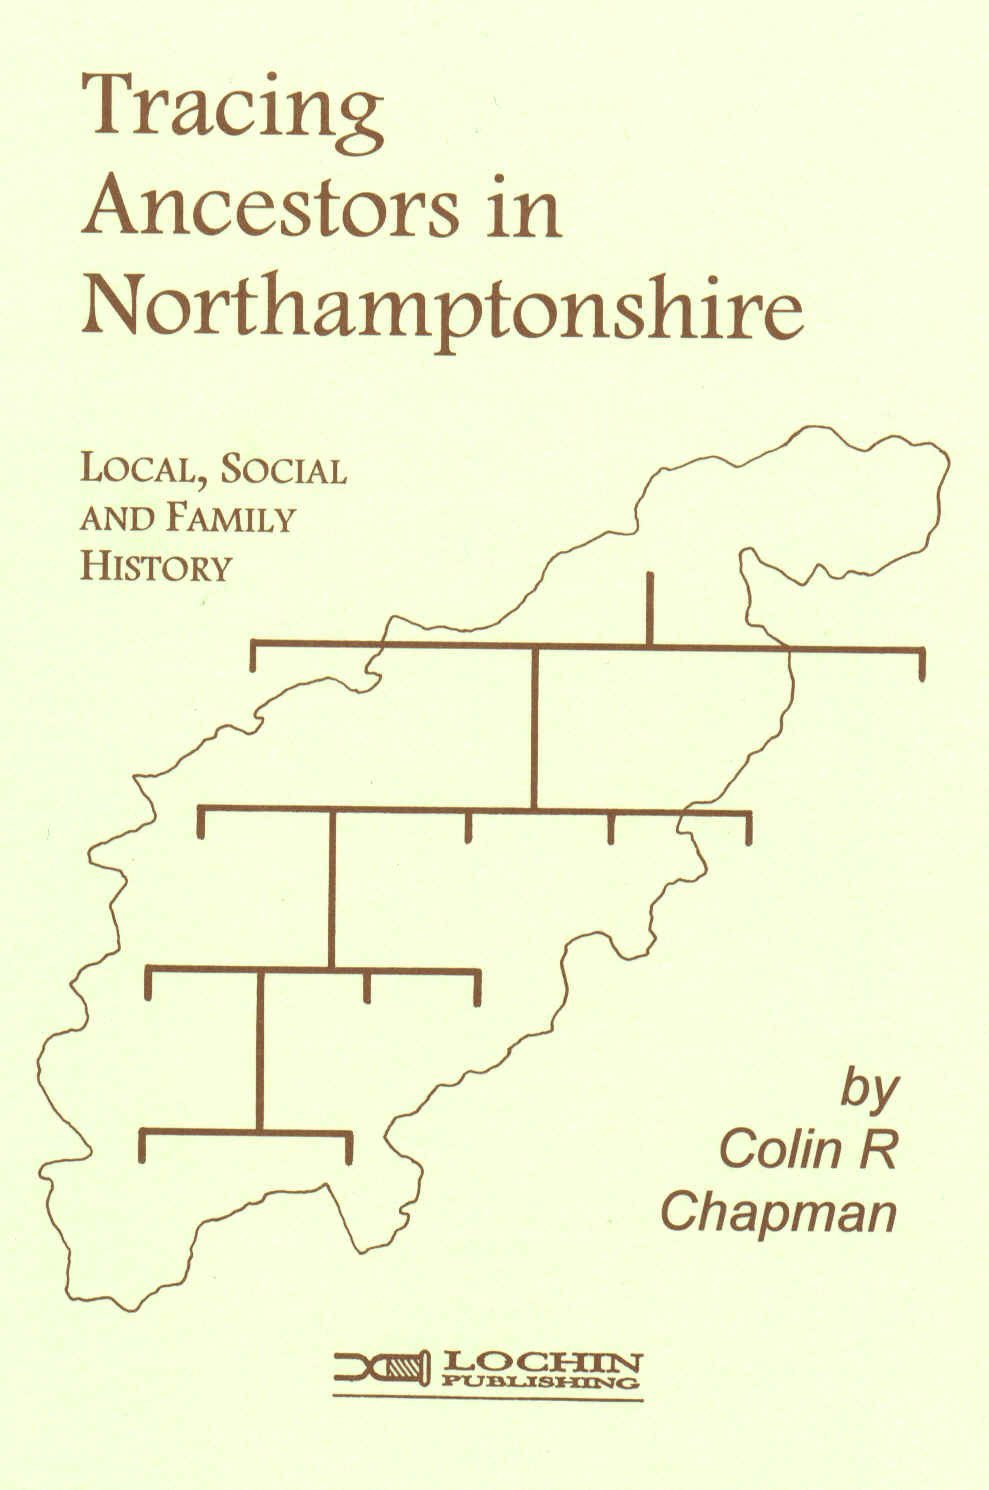 Tracing Ancestors in Northamptonshire